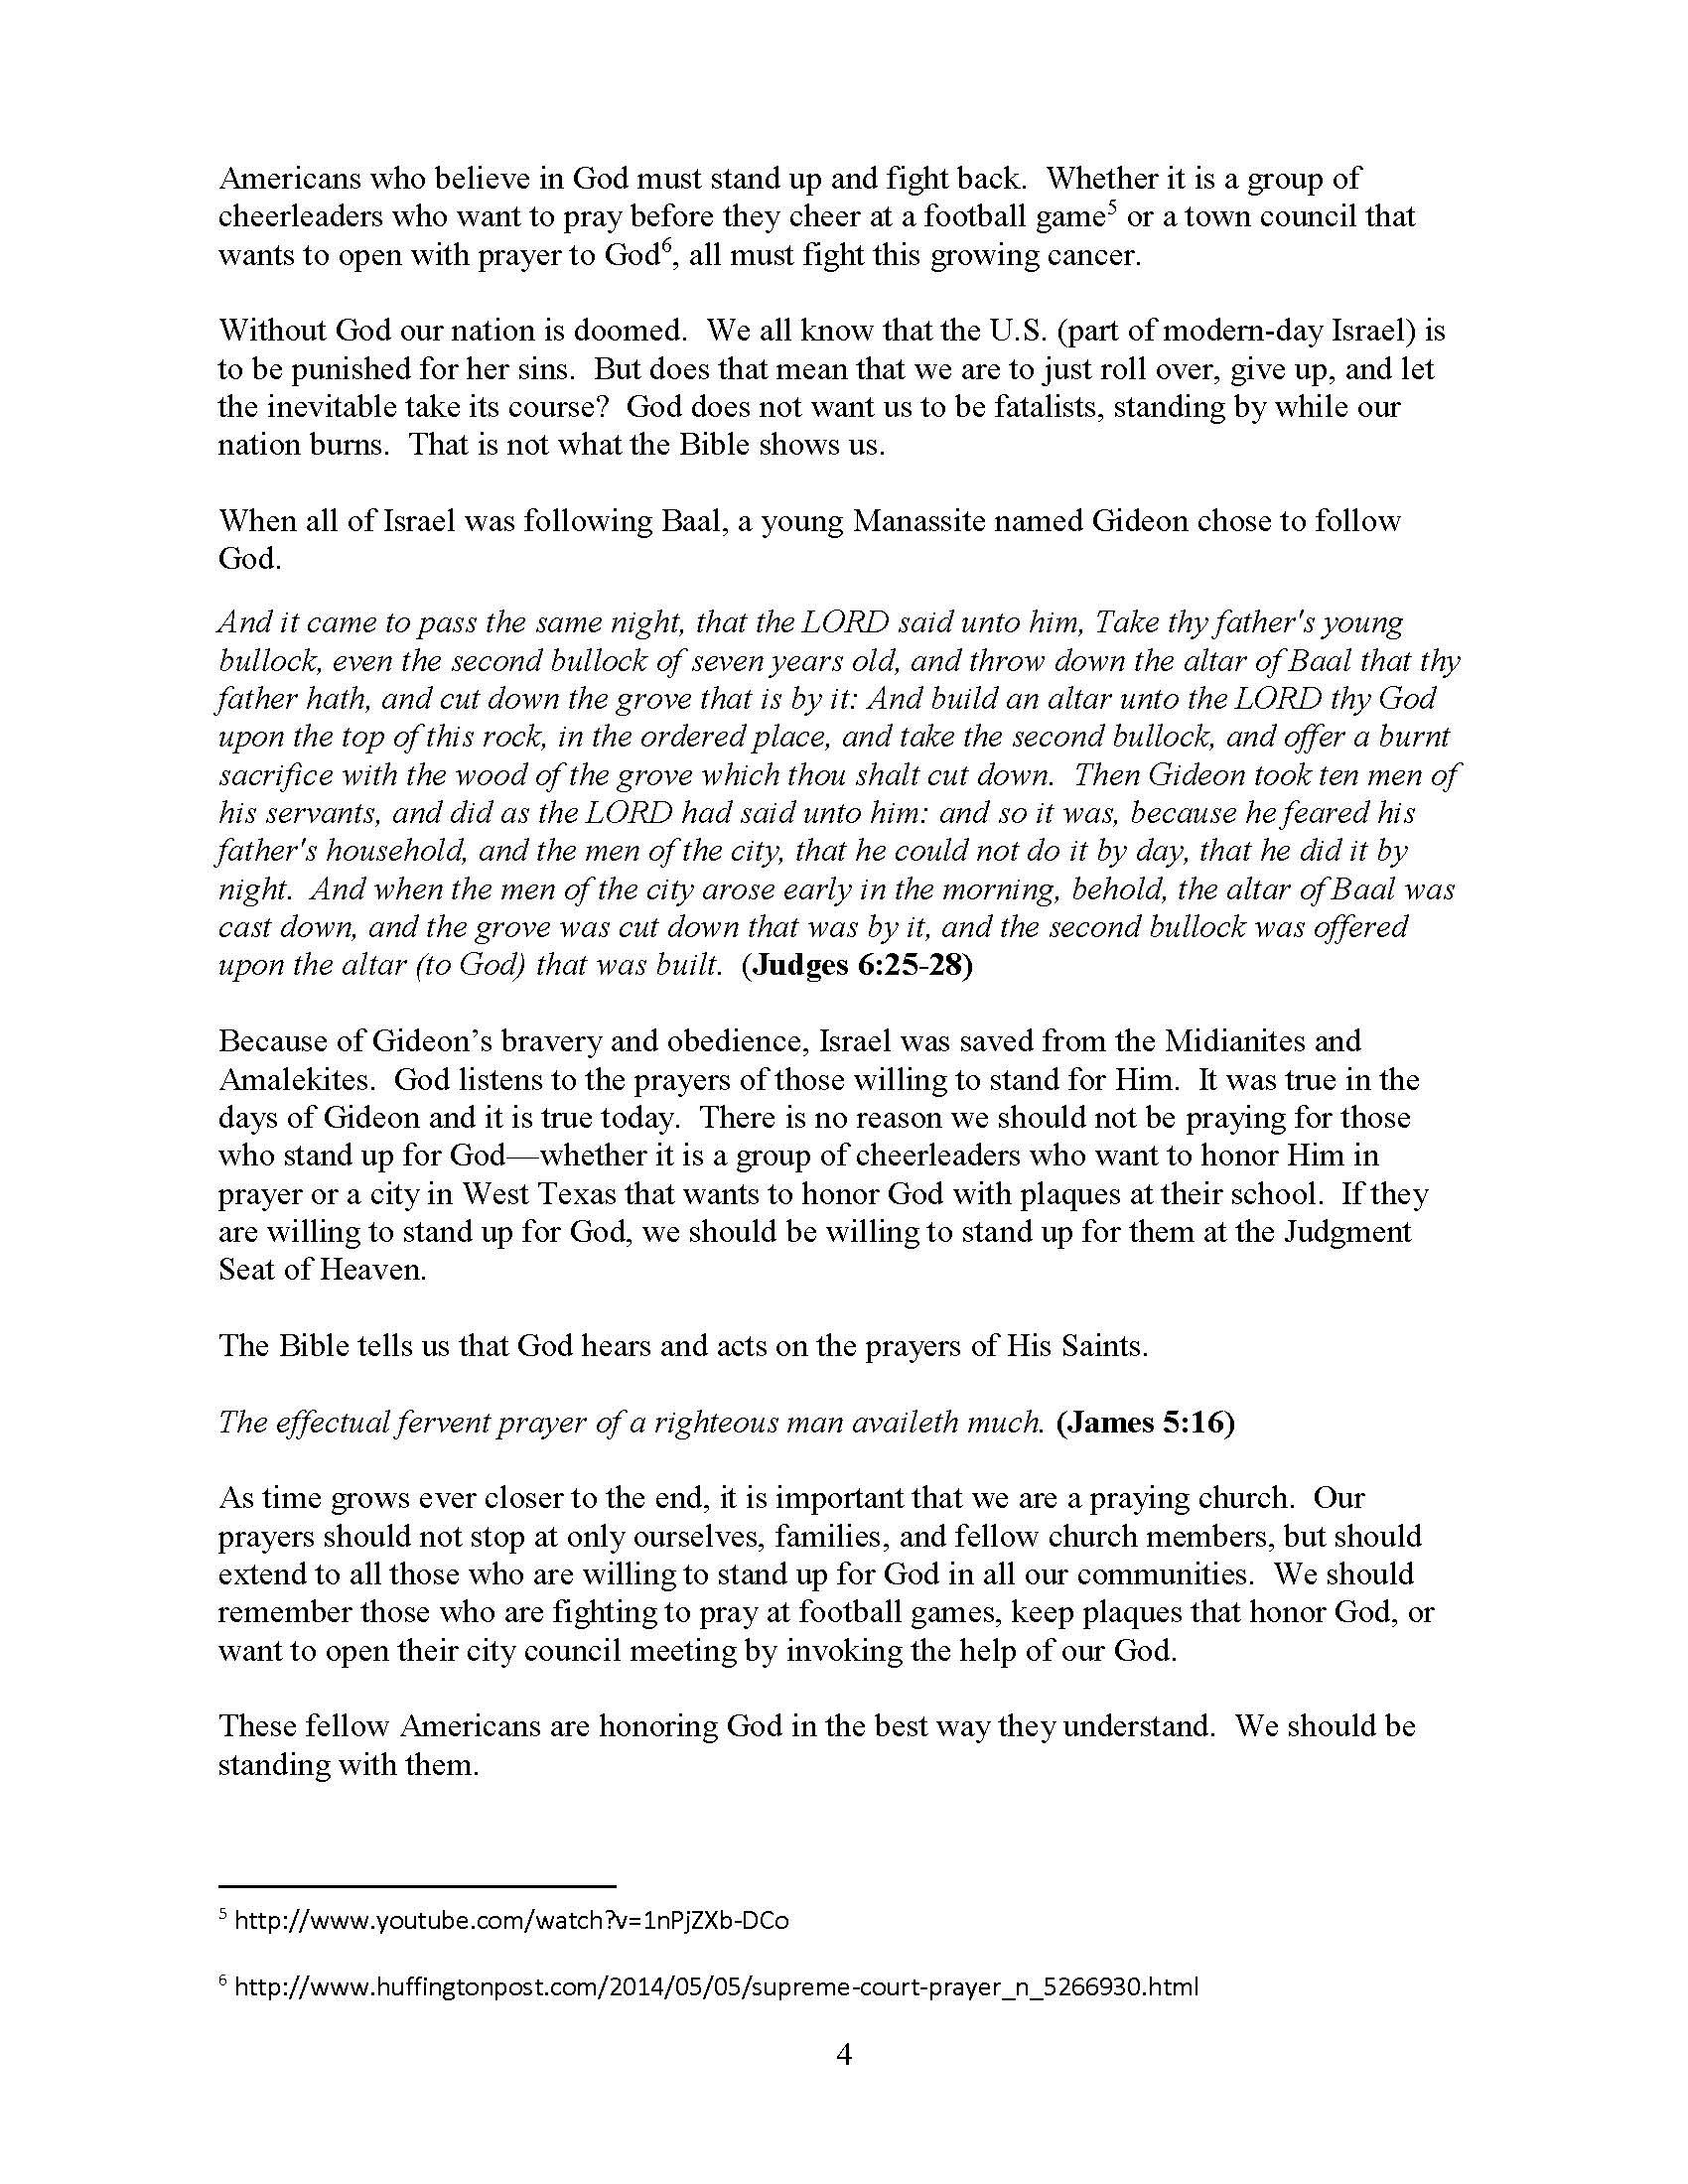 Legacy Letter November 2014_Page_4